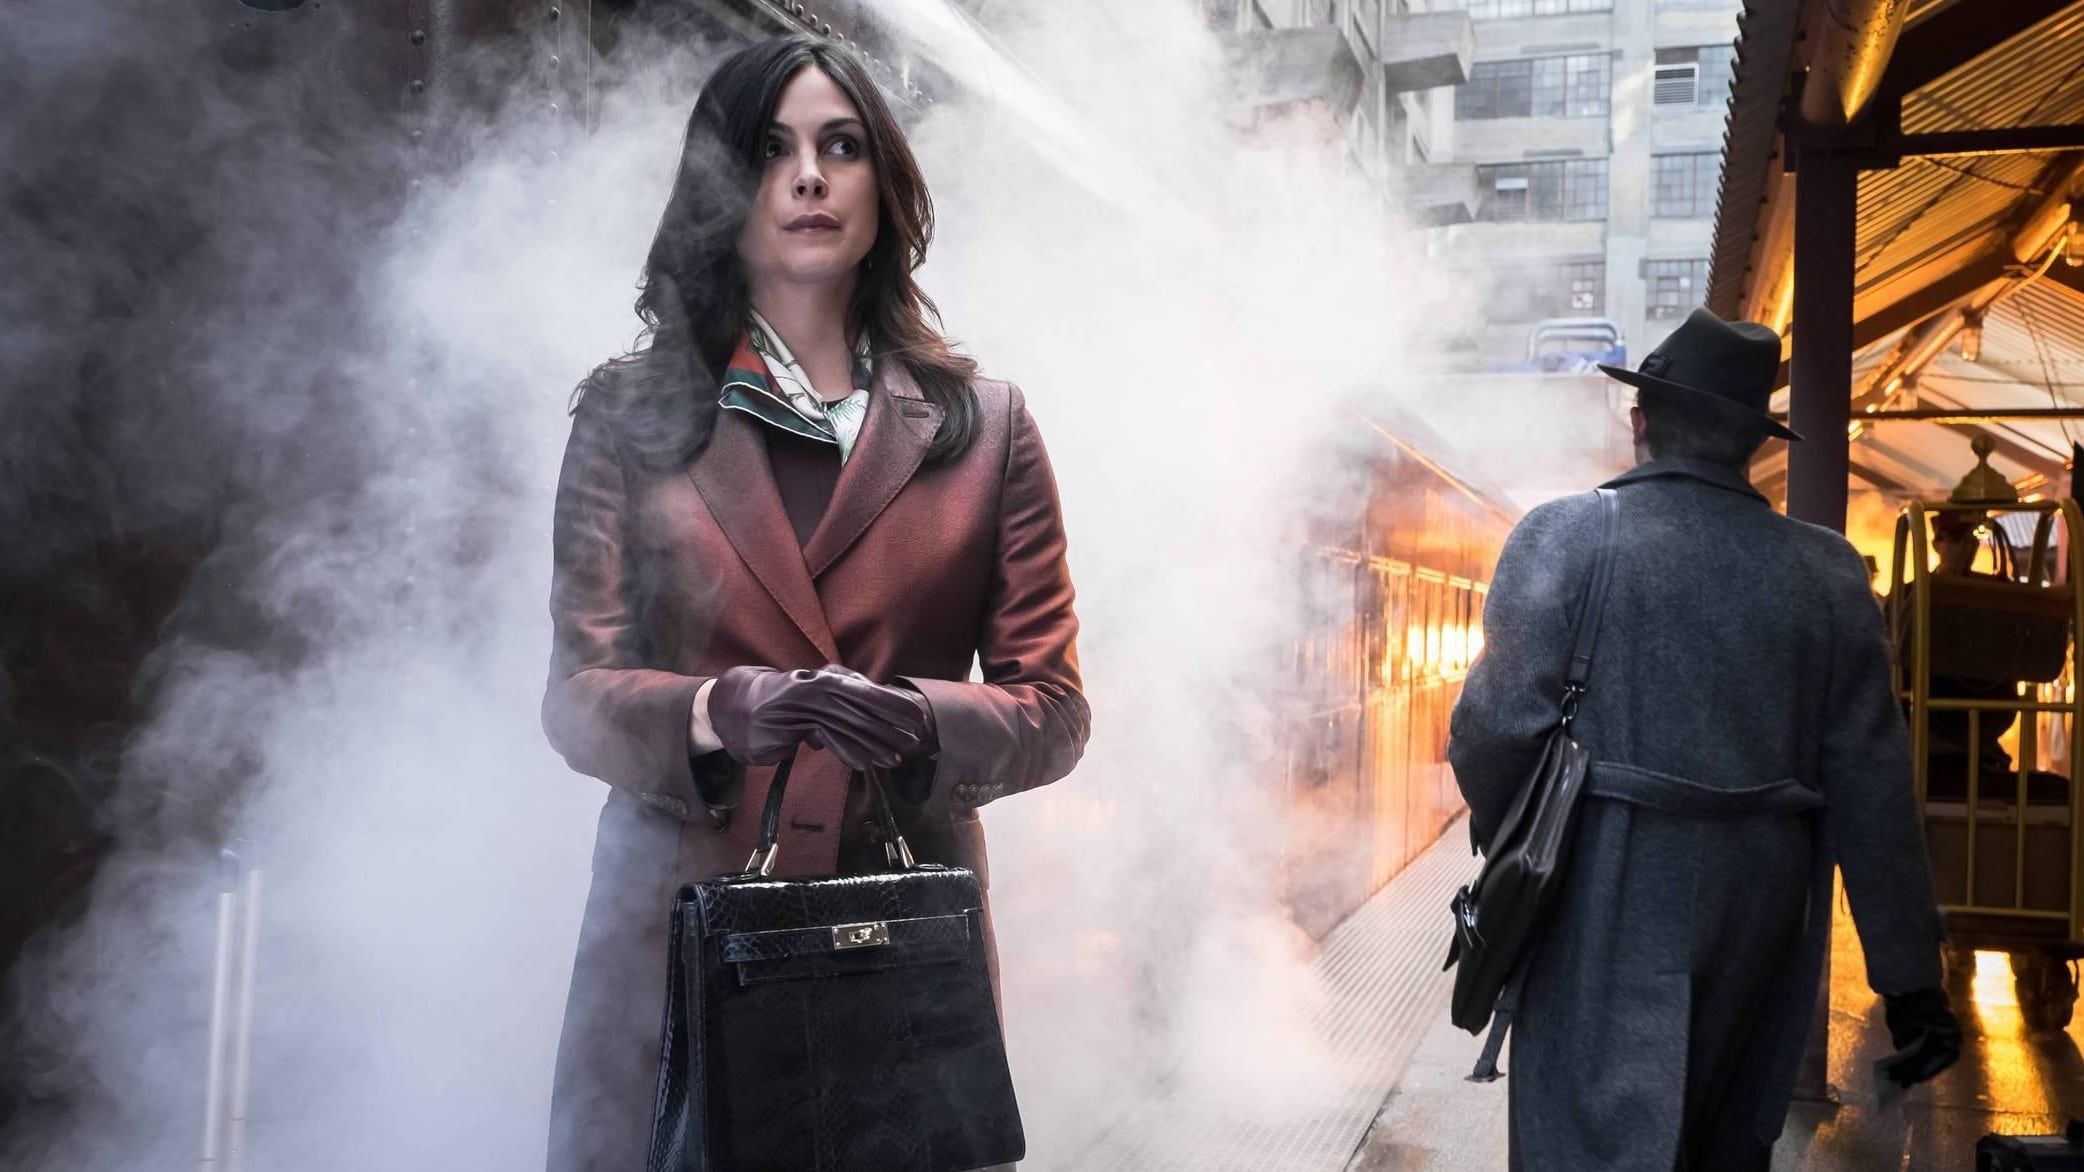 Gotham - Season 3 Episode 2 : Mad City: Burn the Witch